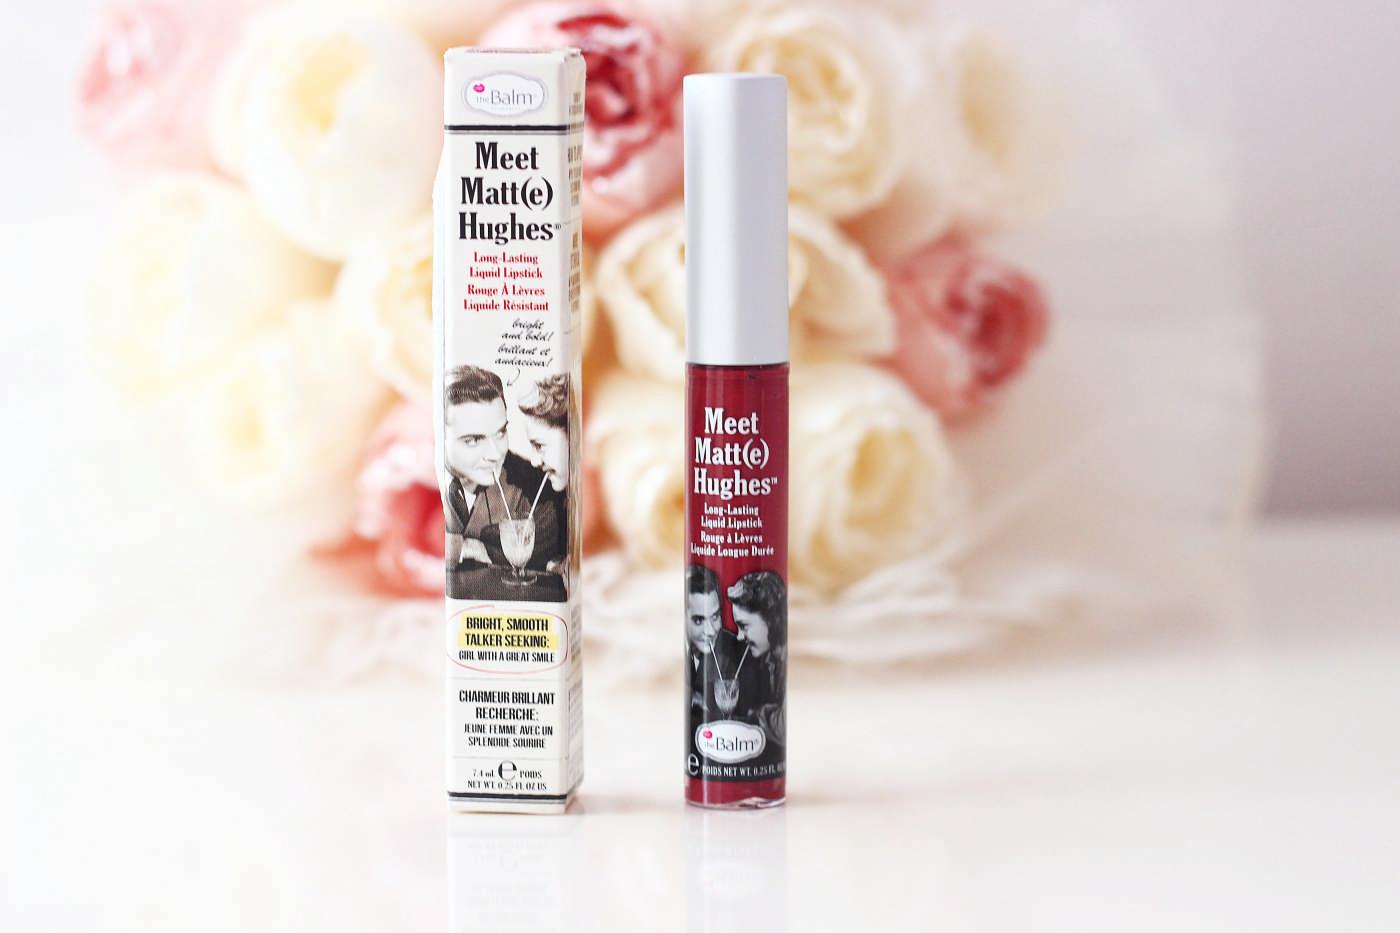 The Balm Meet Matte Hughes Liquid Lipstick Likit Mat Ruj - Trustworthy